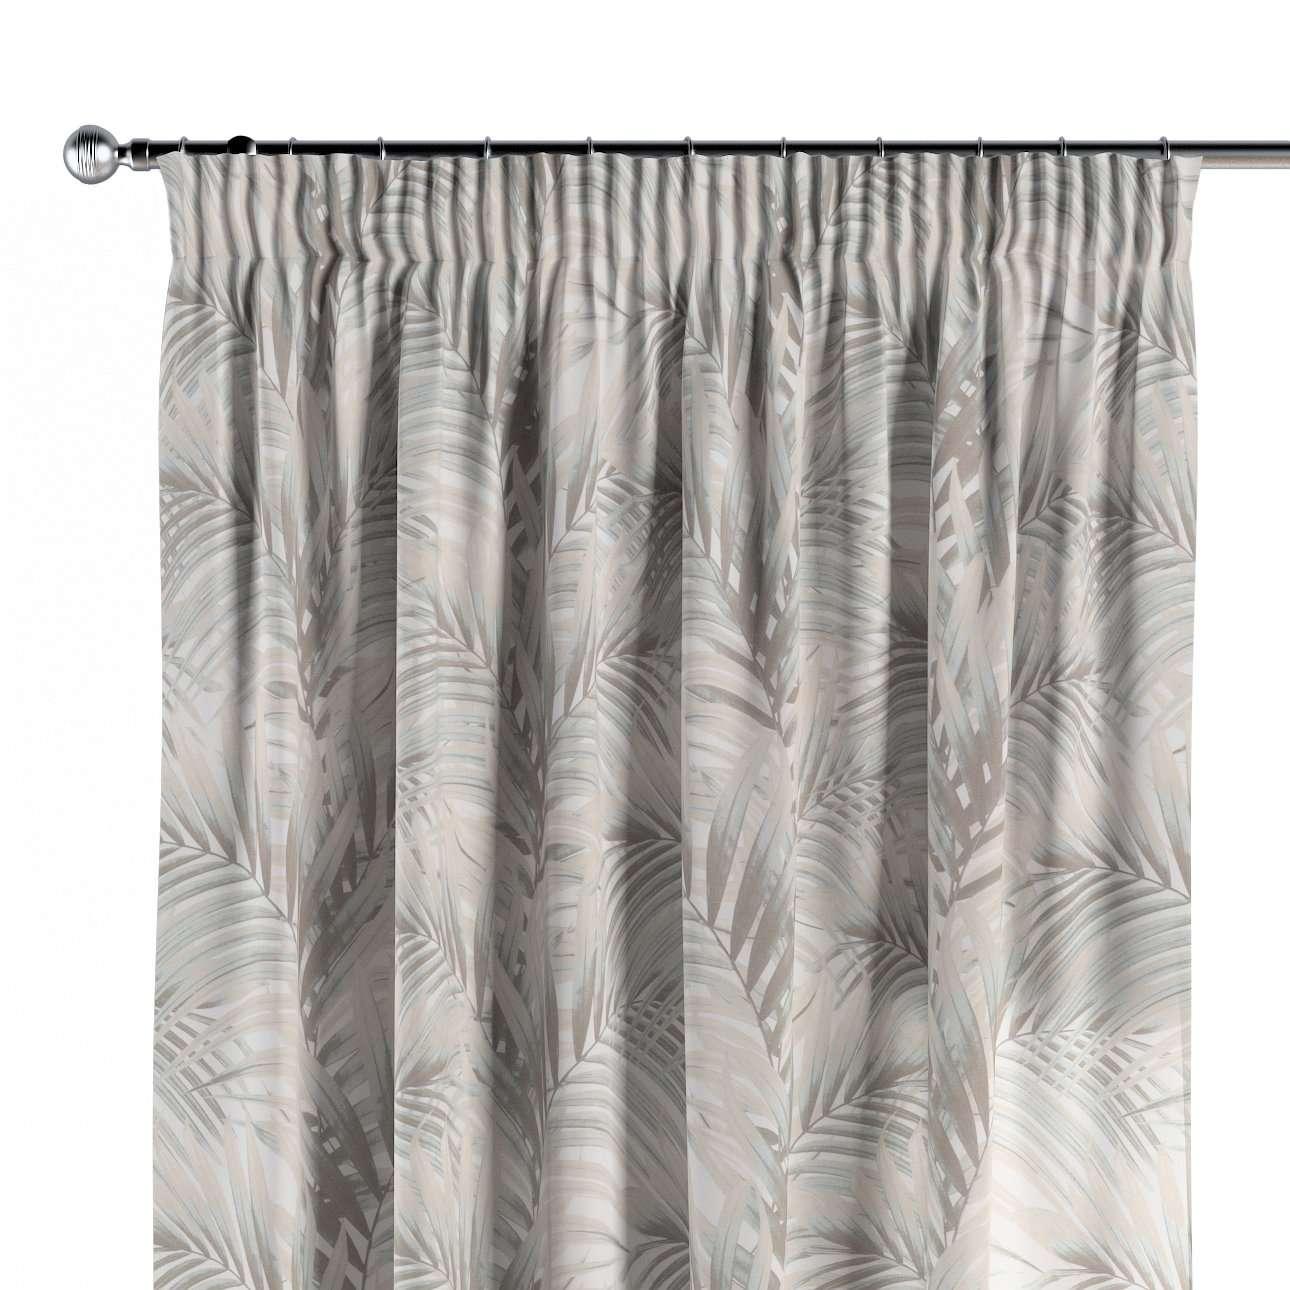 Pencil pleat curtain in collection Gardenia, fabric: 142-14